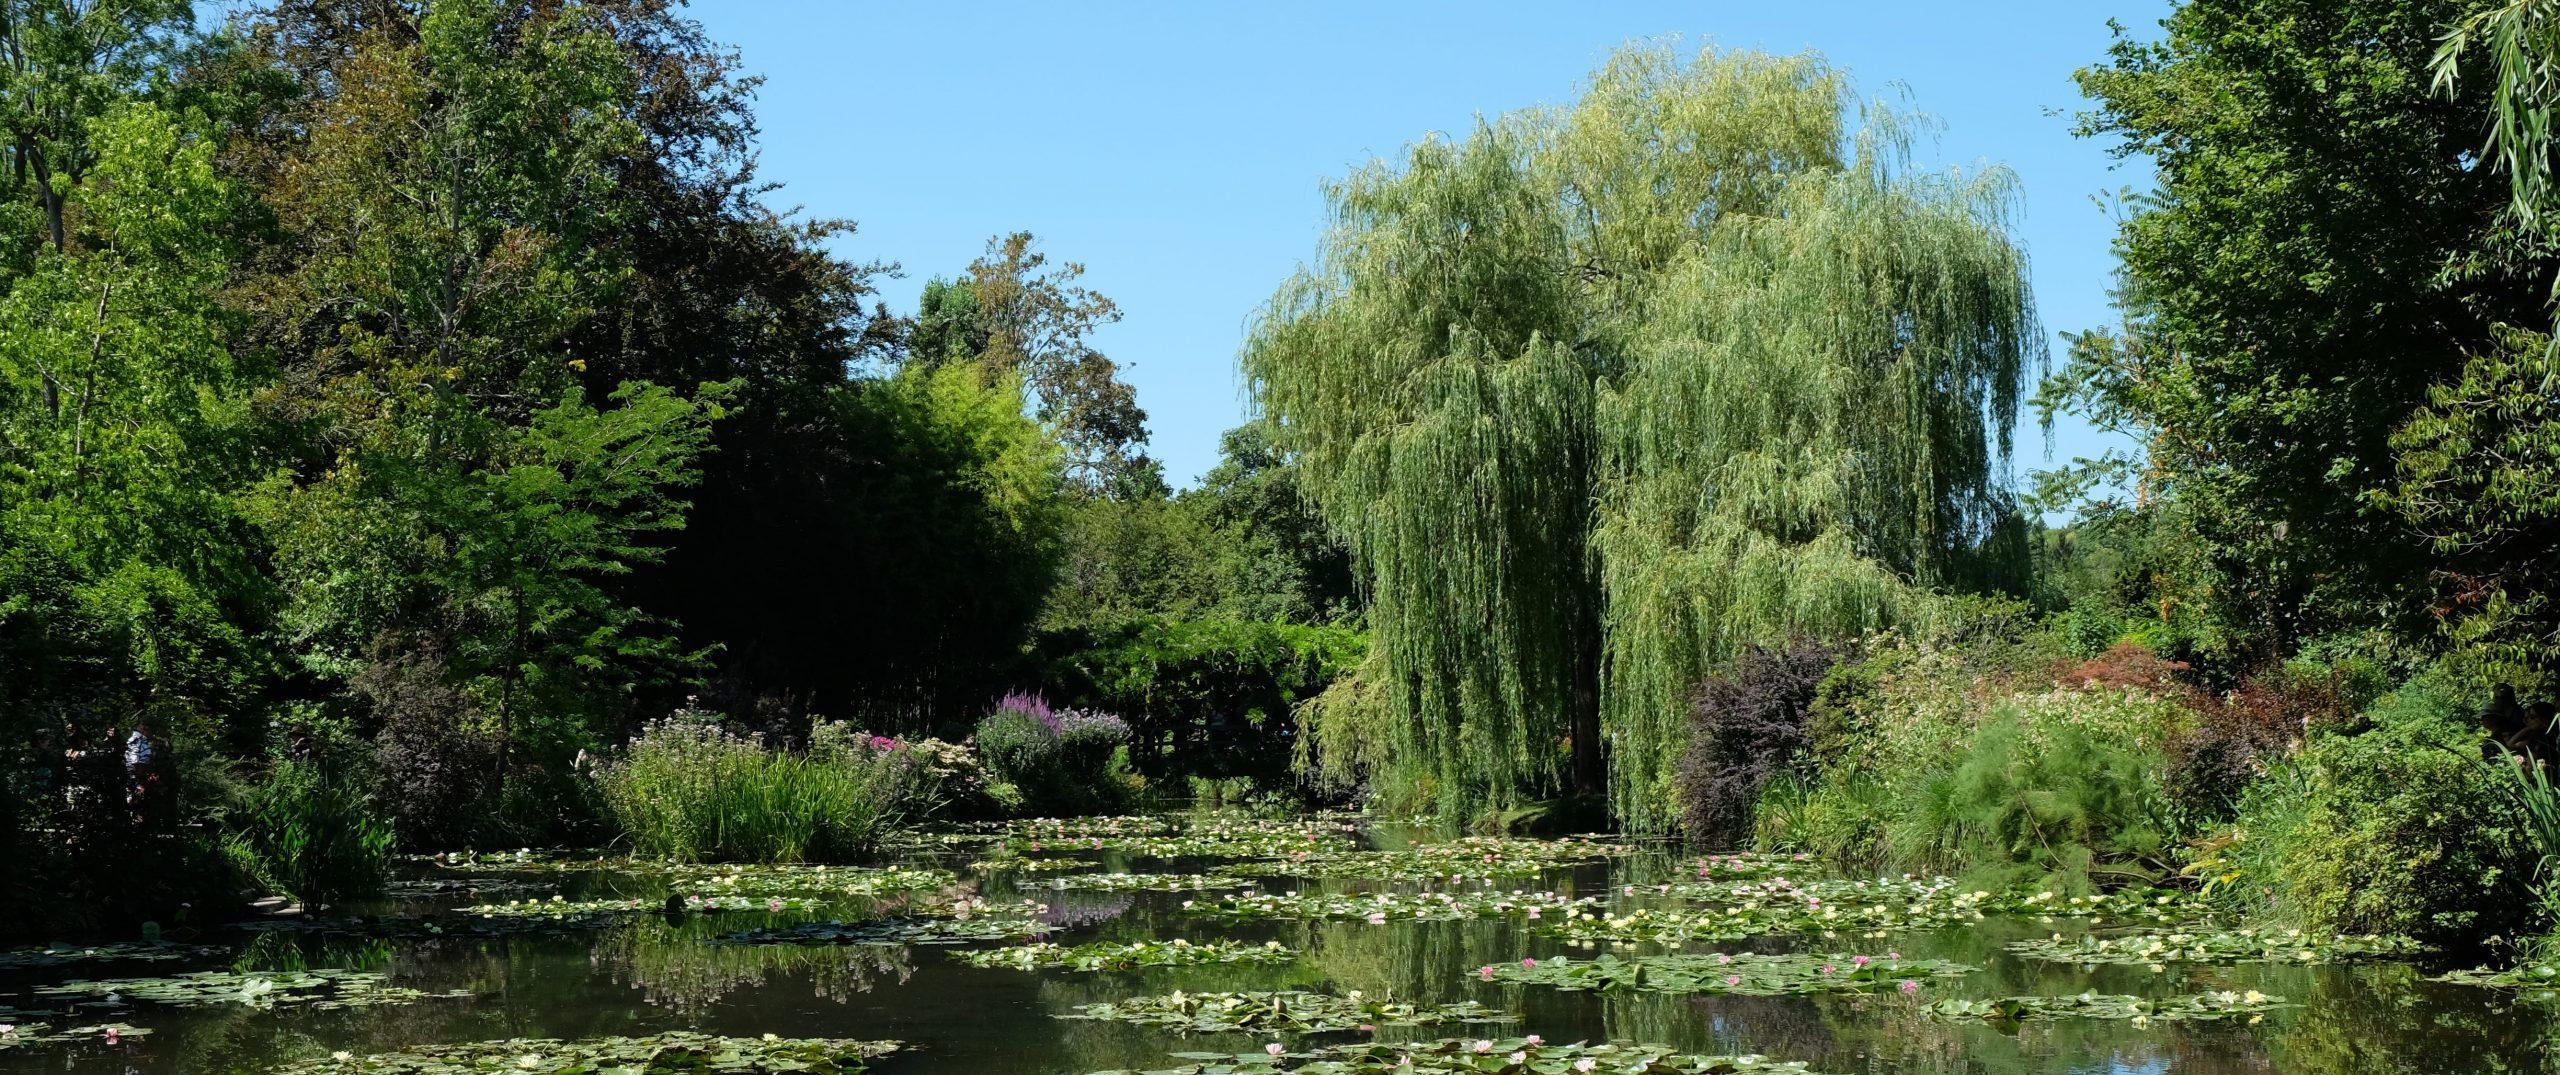 Giverny Maison de Monet